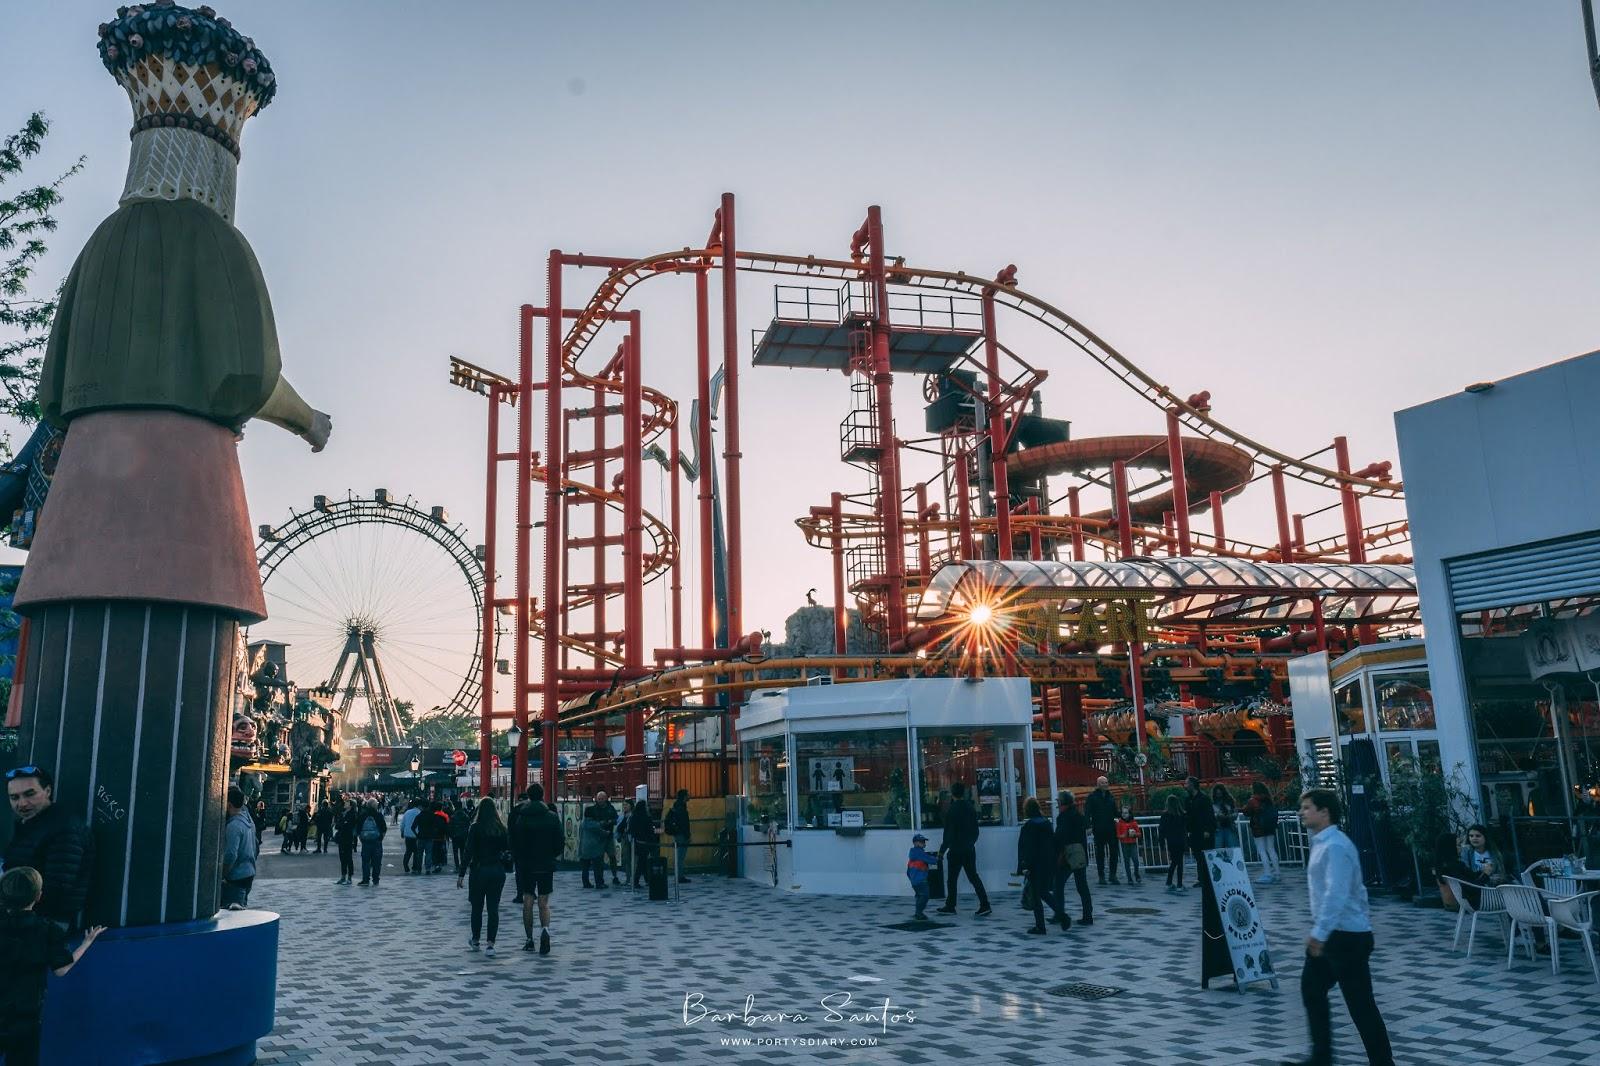 rollercoasters at Würstelprater -  Vienna